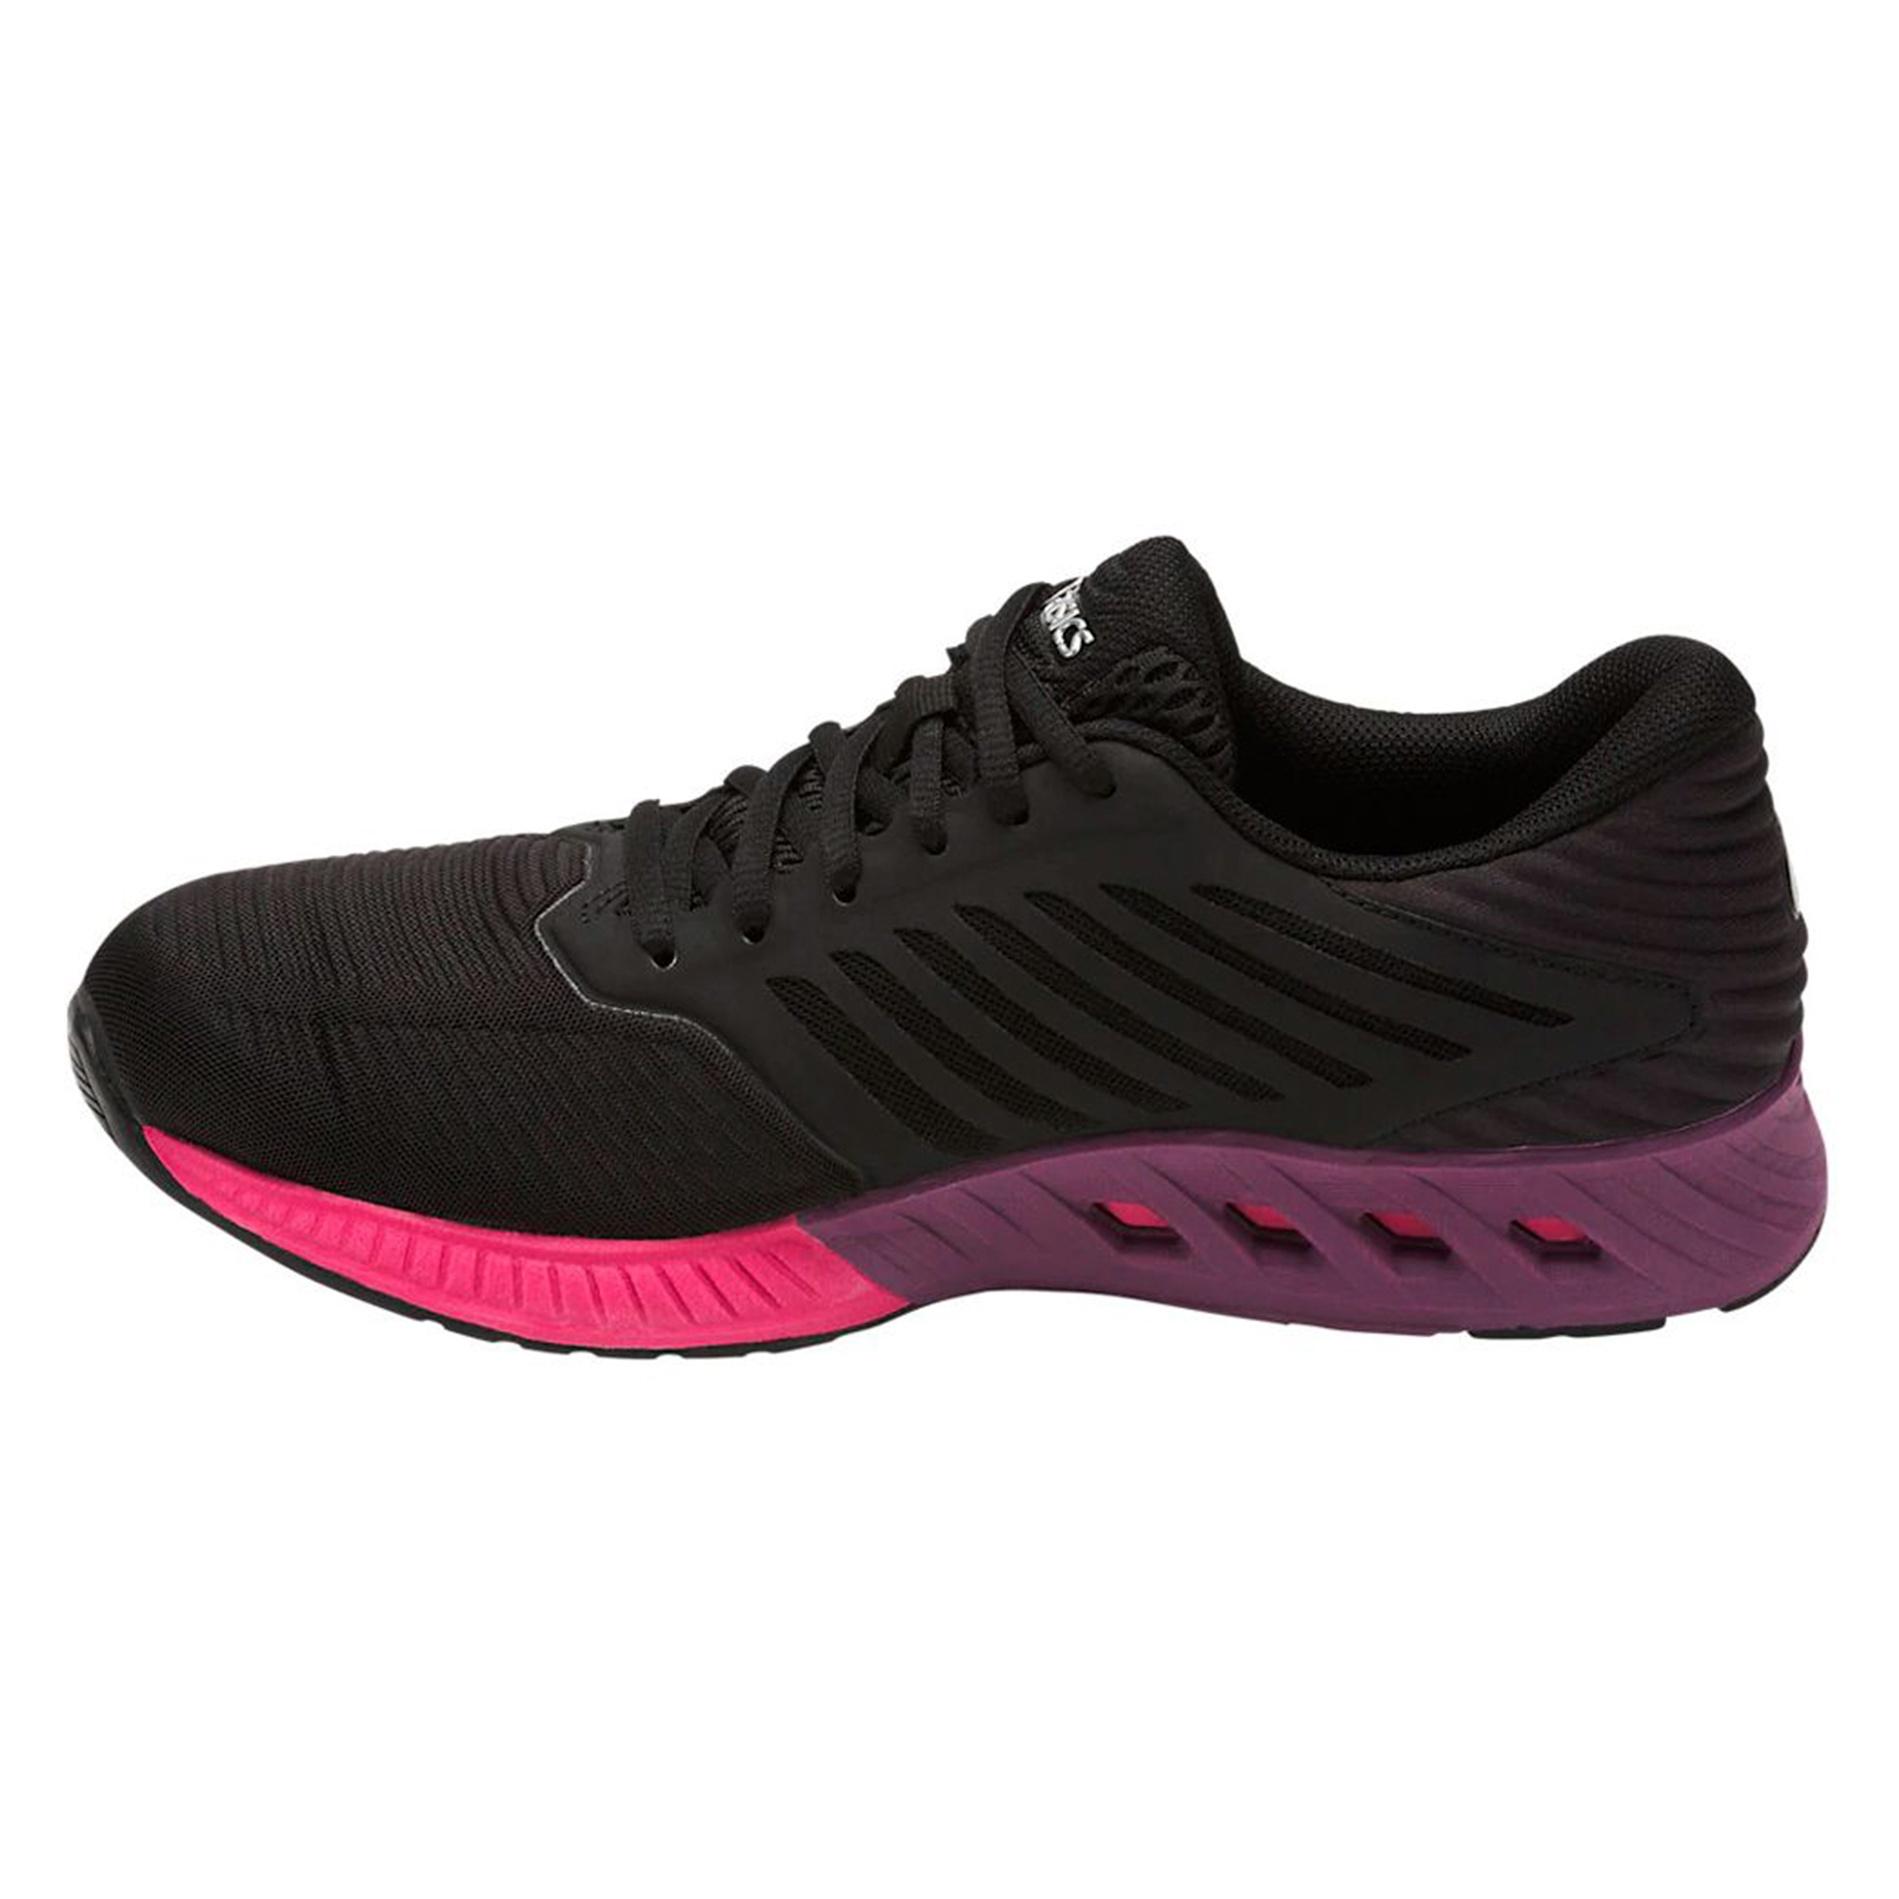 کفش دویدن زنانه اسیکس T689N-9093